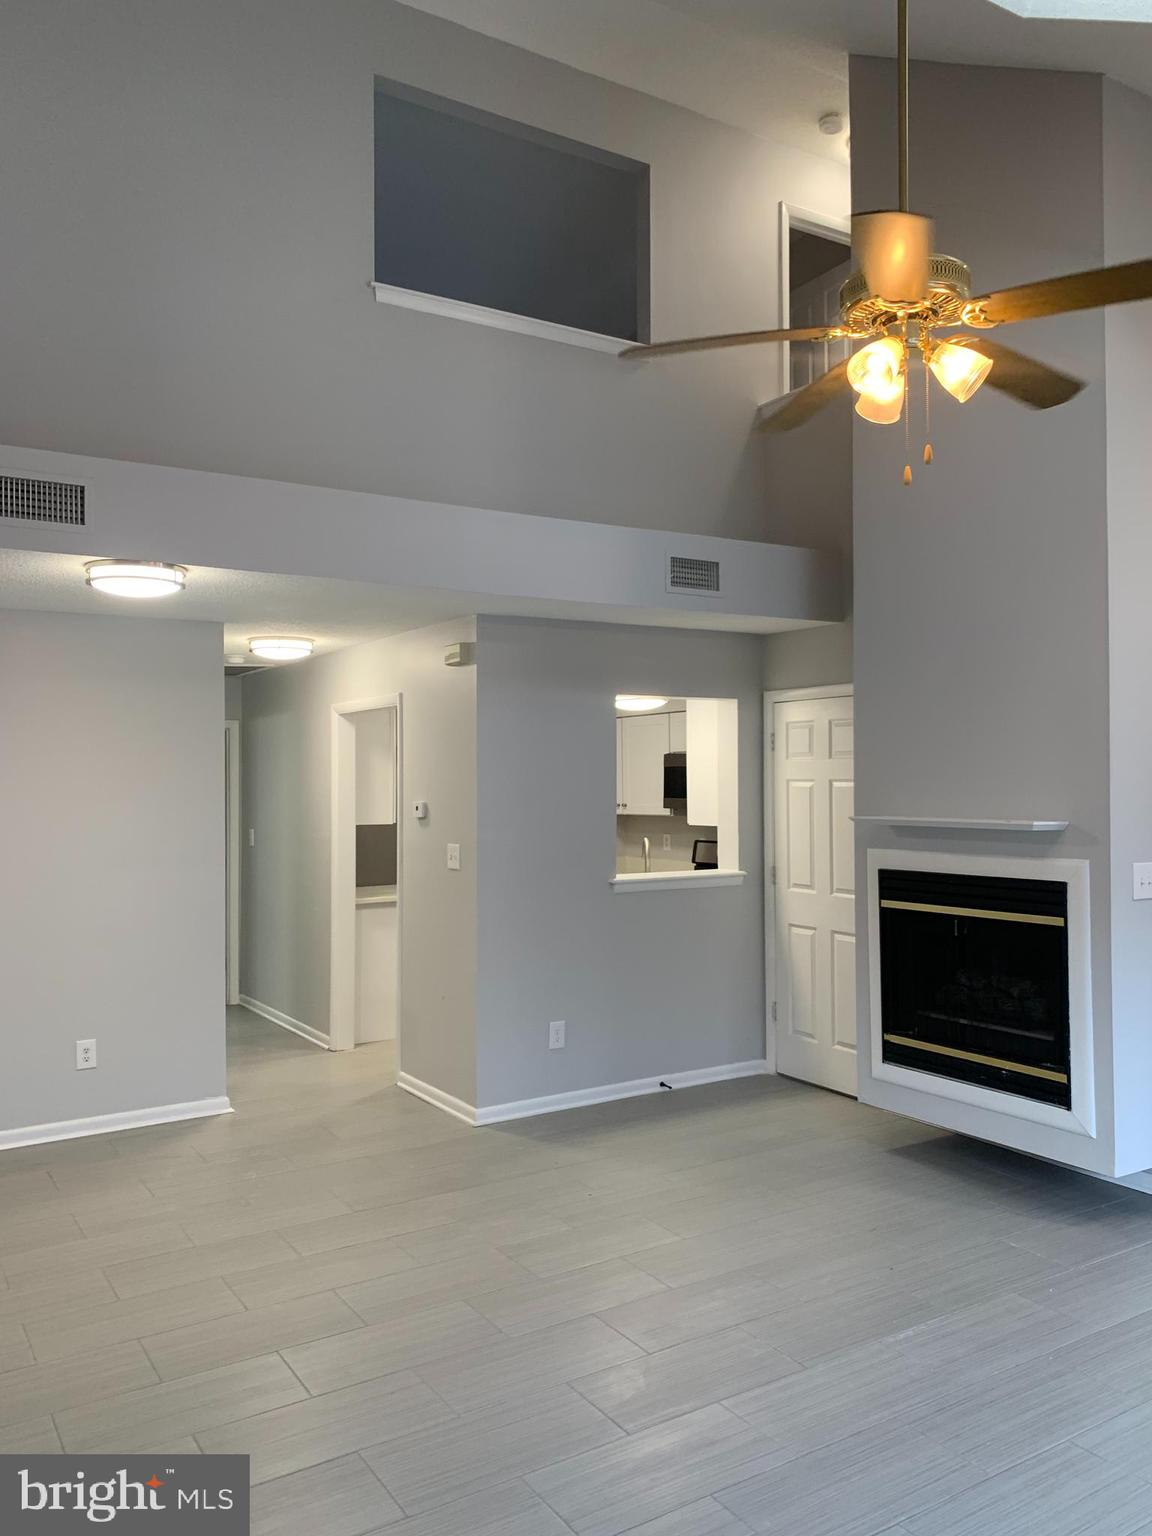 15 EVERGREEN PLACE, Hampton, Virginia 23666, 2 Bedrooms Bedrooms, ,2 BathroomsBathrooms,Townhouse,For Sale,15 EVERGREEN PLACE,VAHM100044